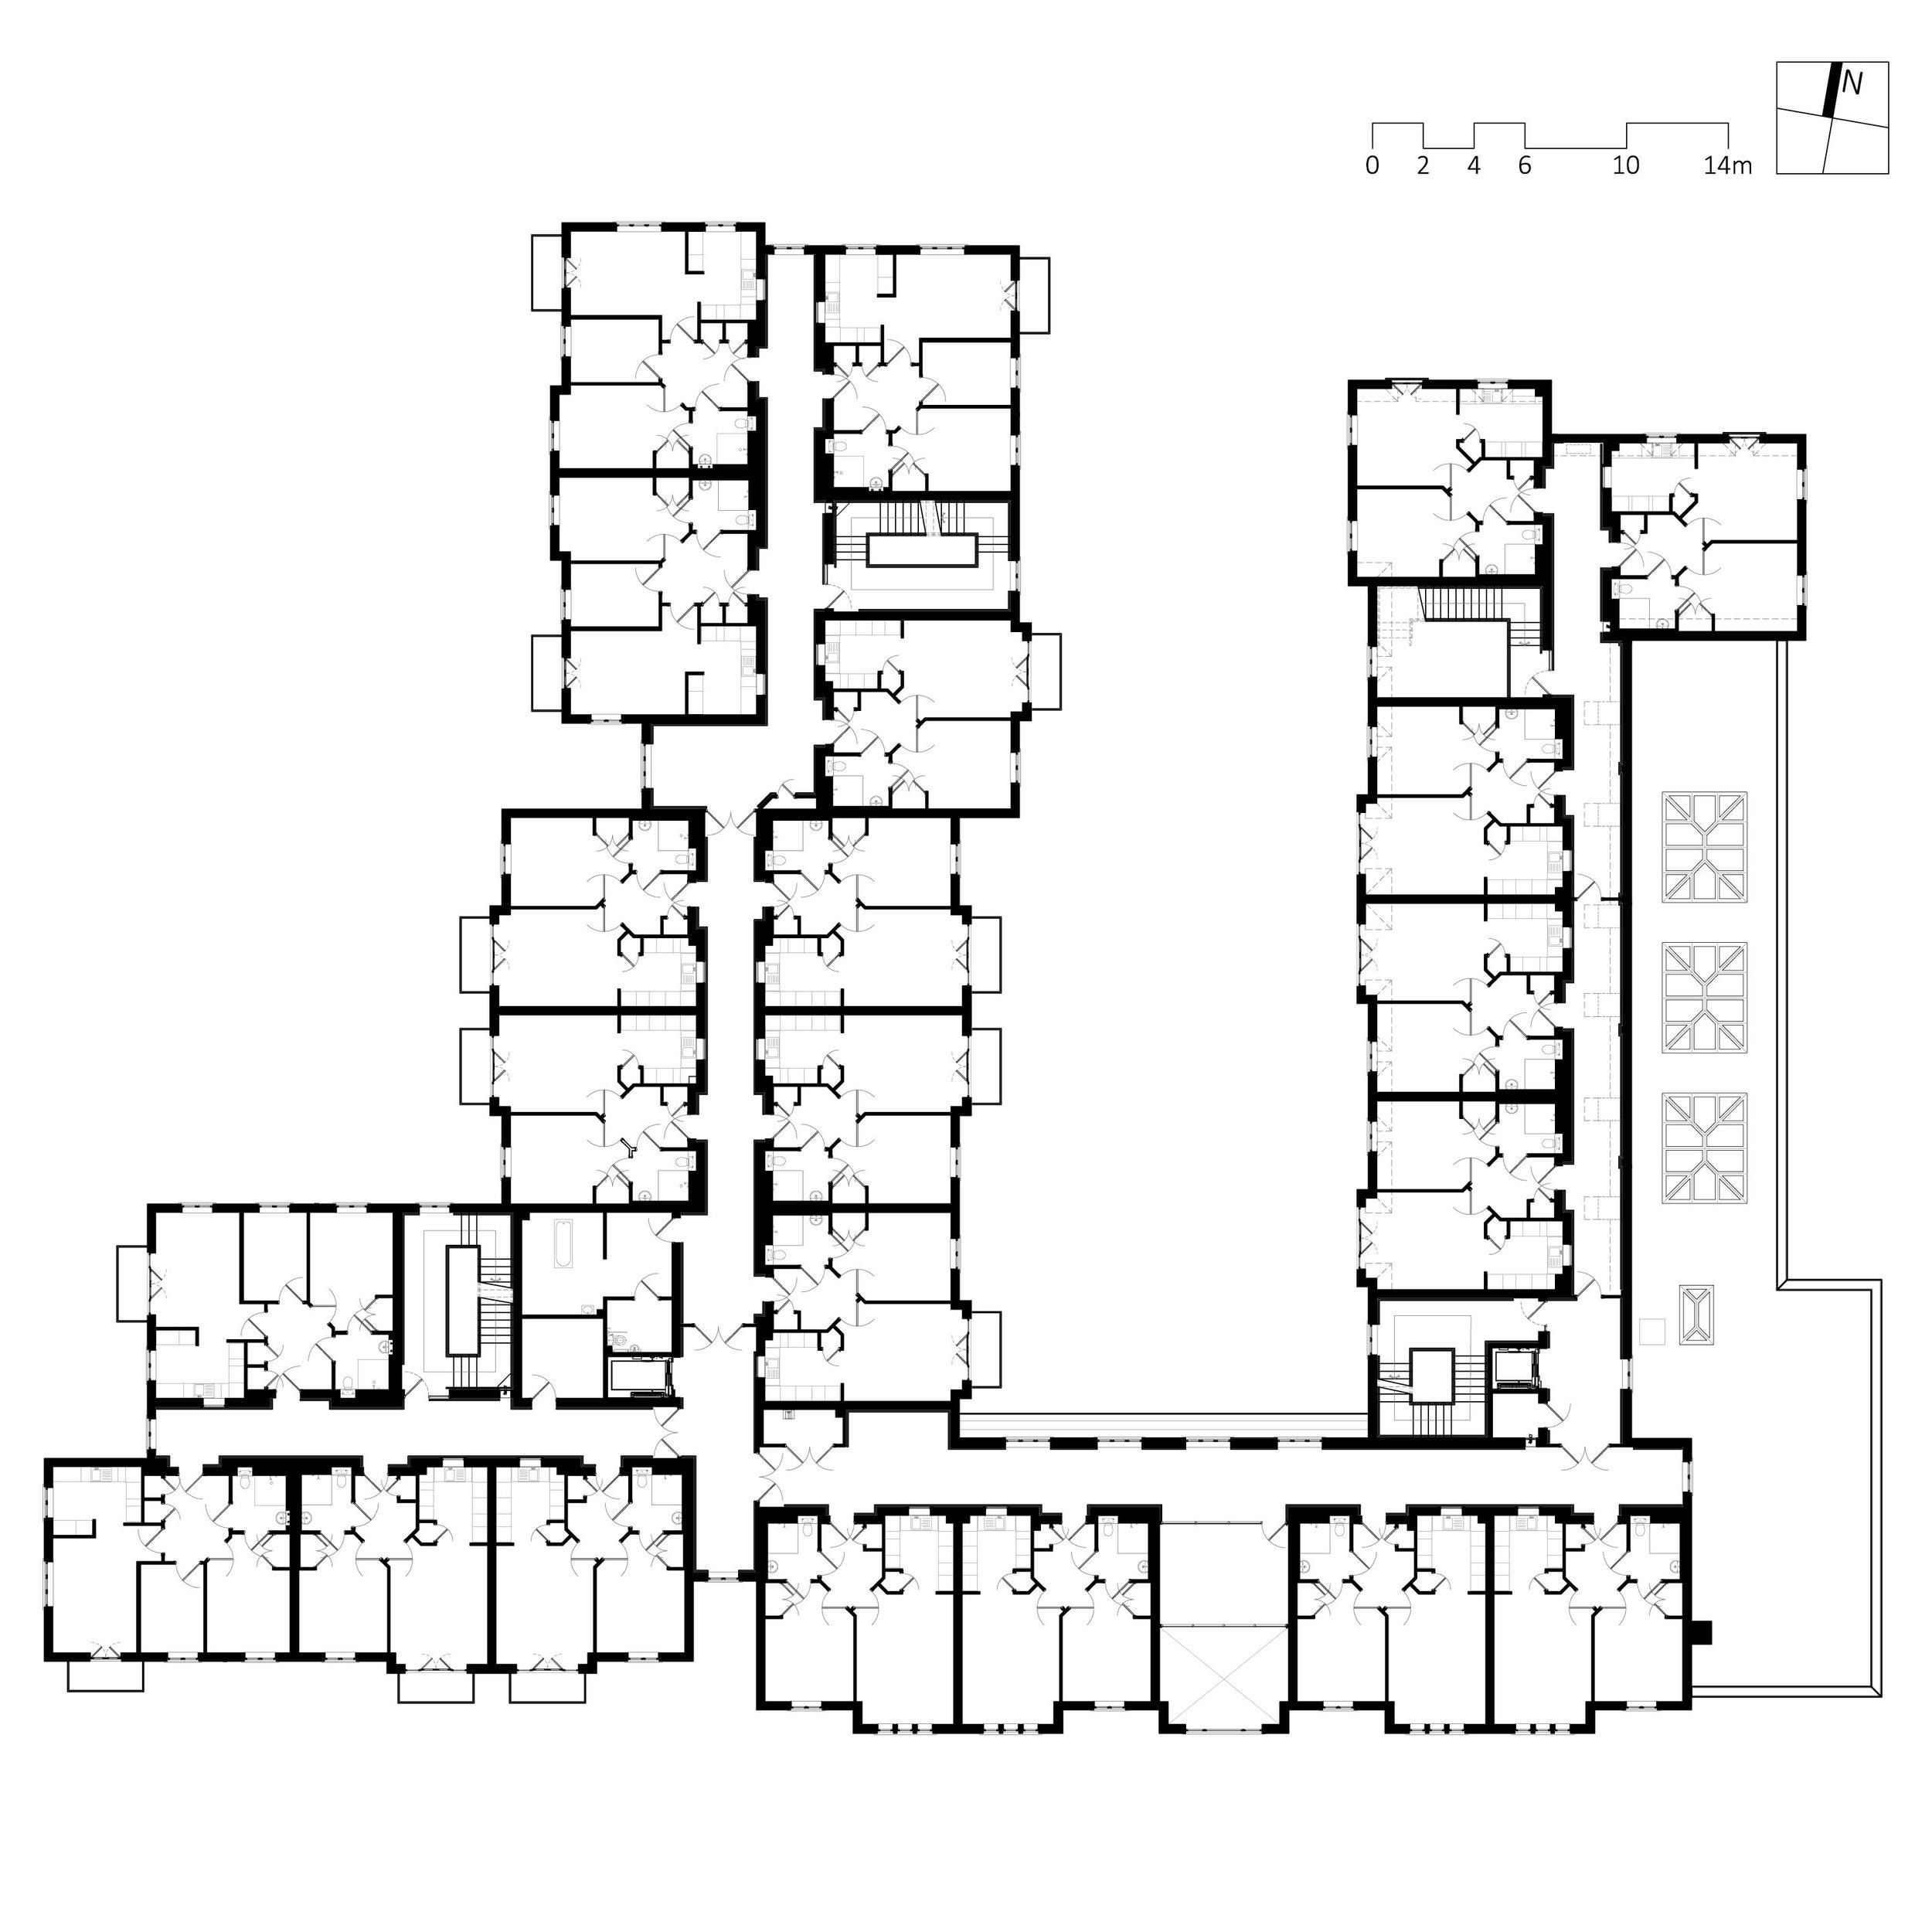 typical floor plan of building